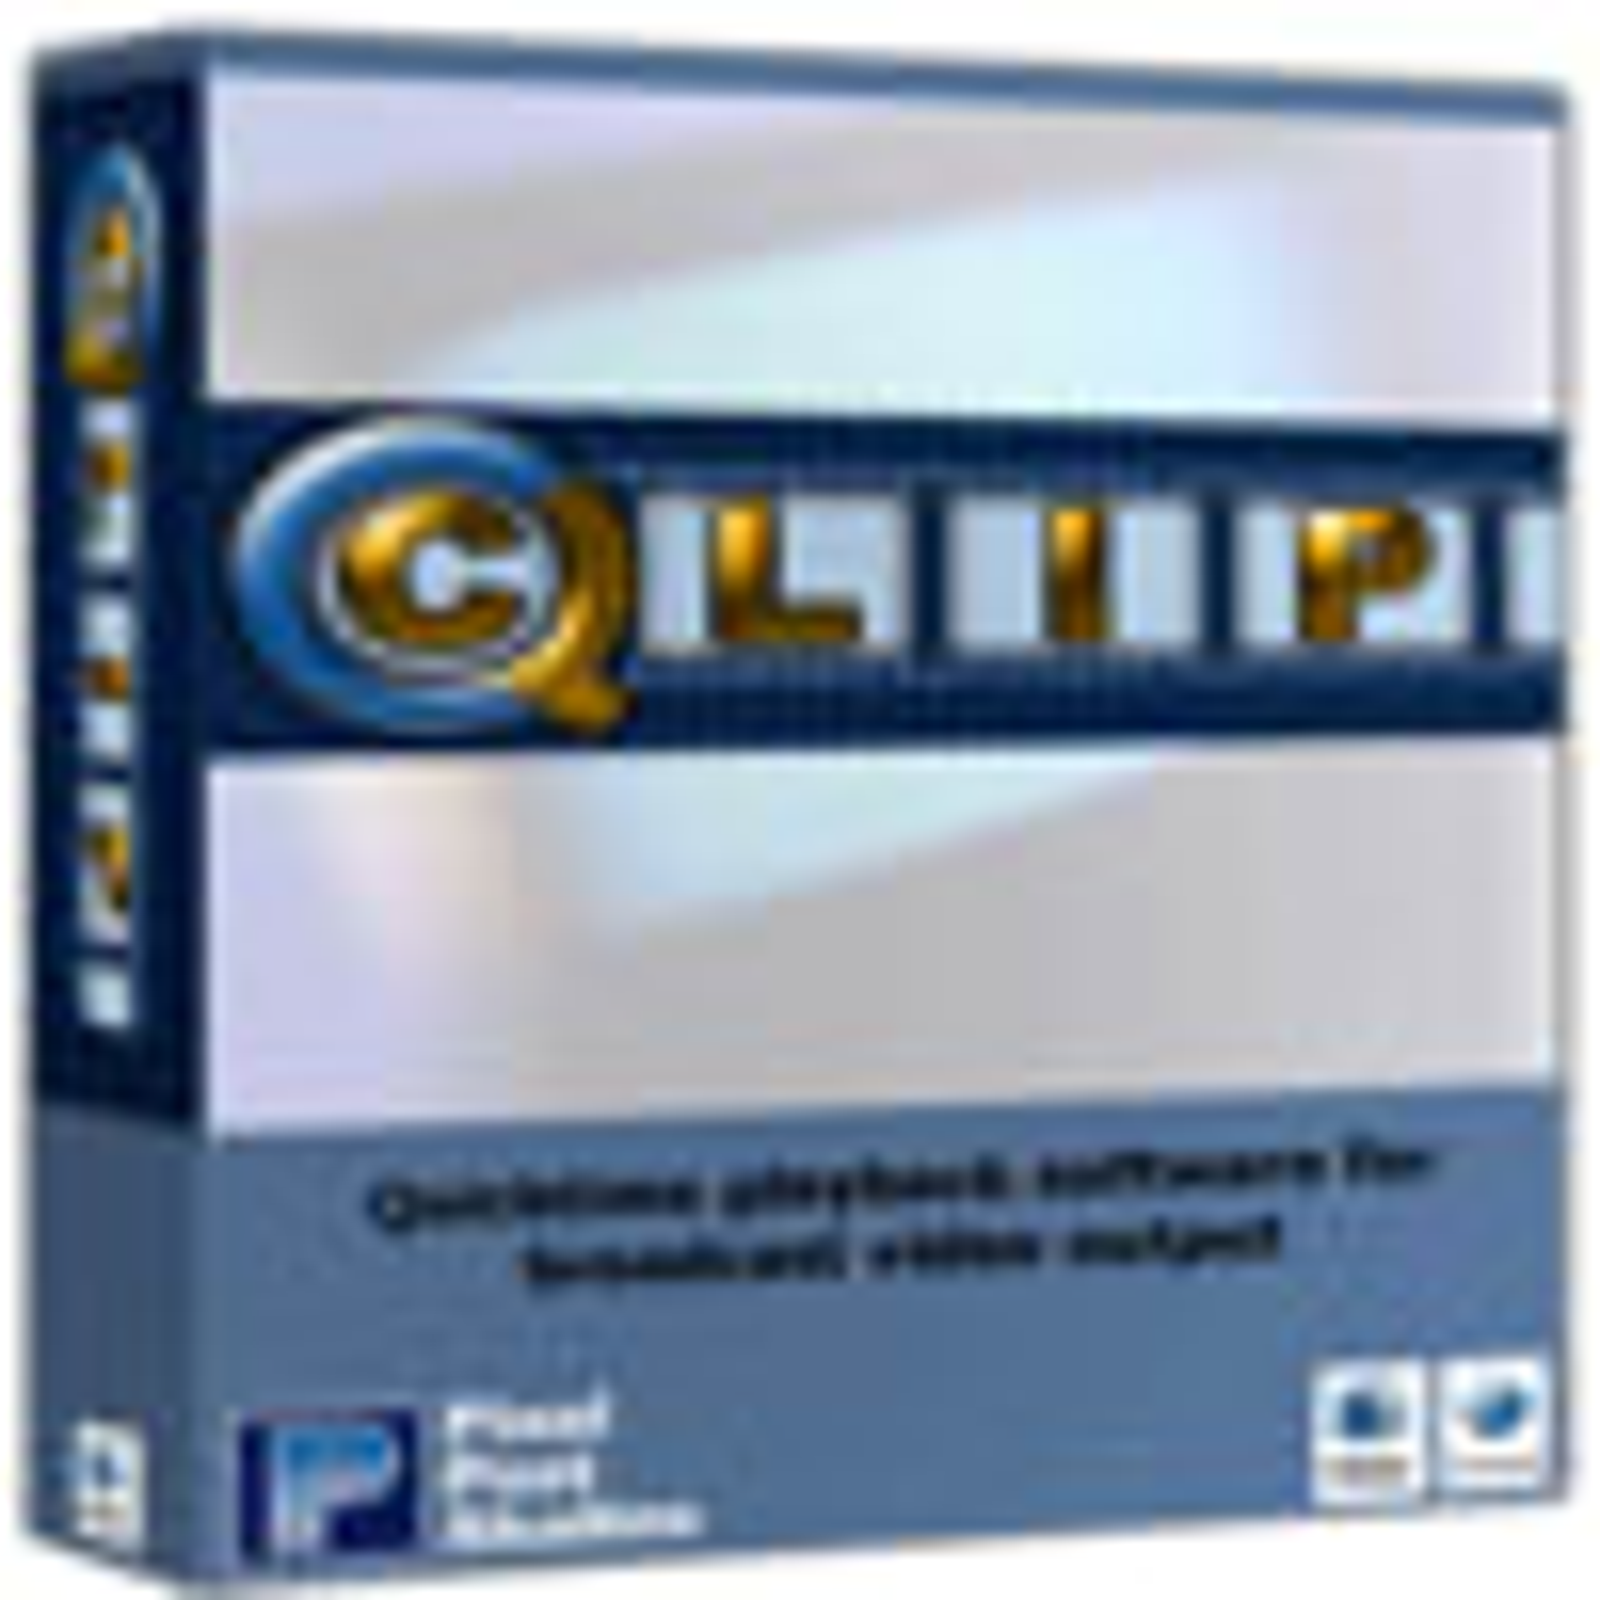 QClip